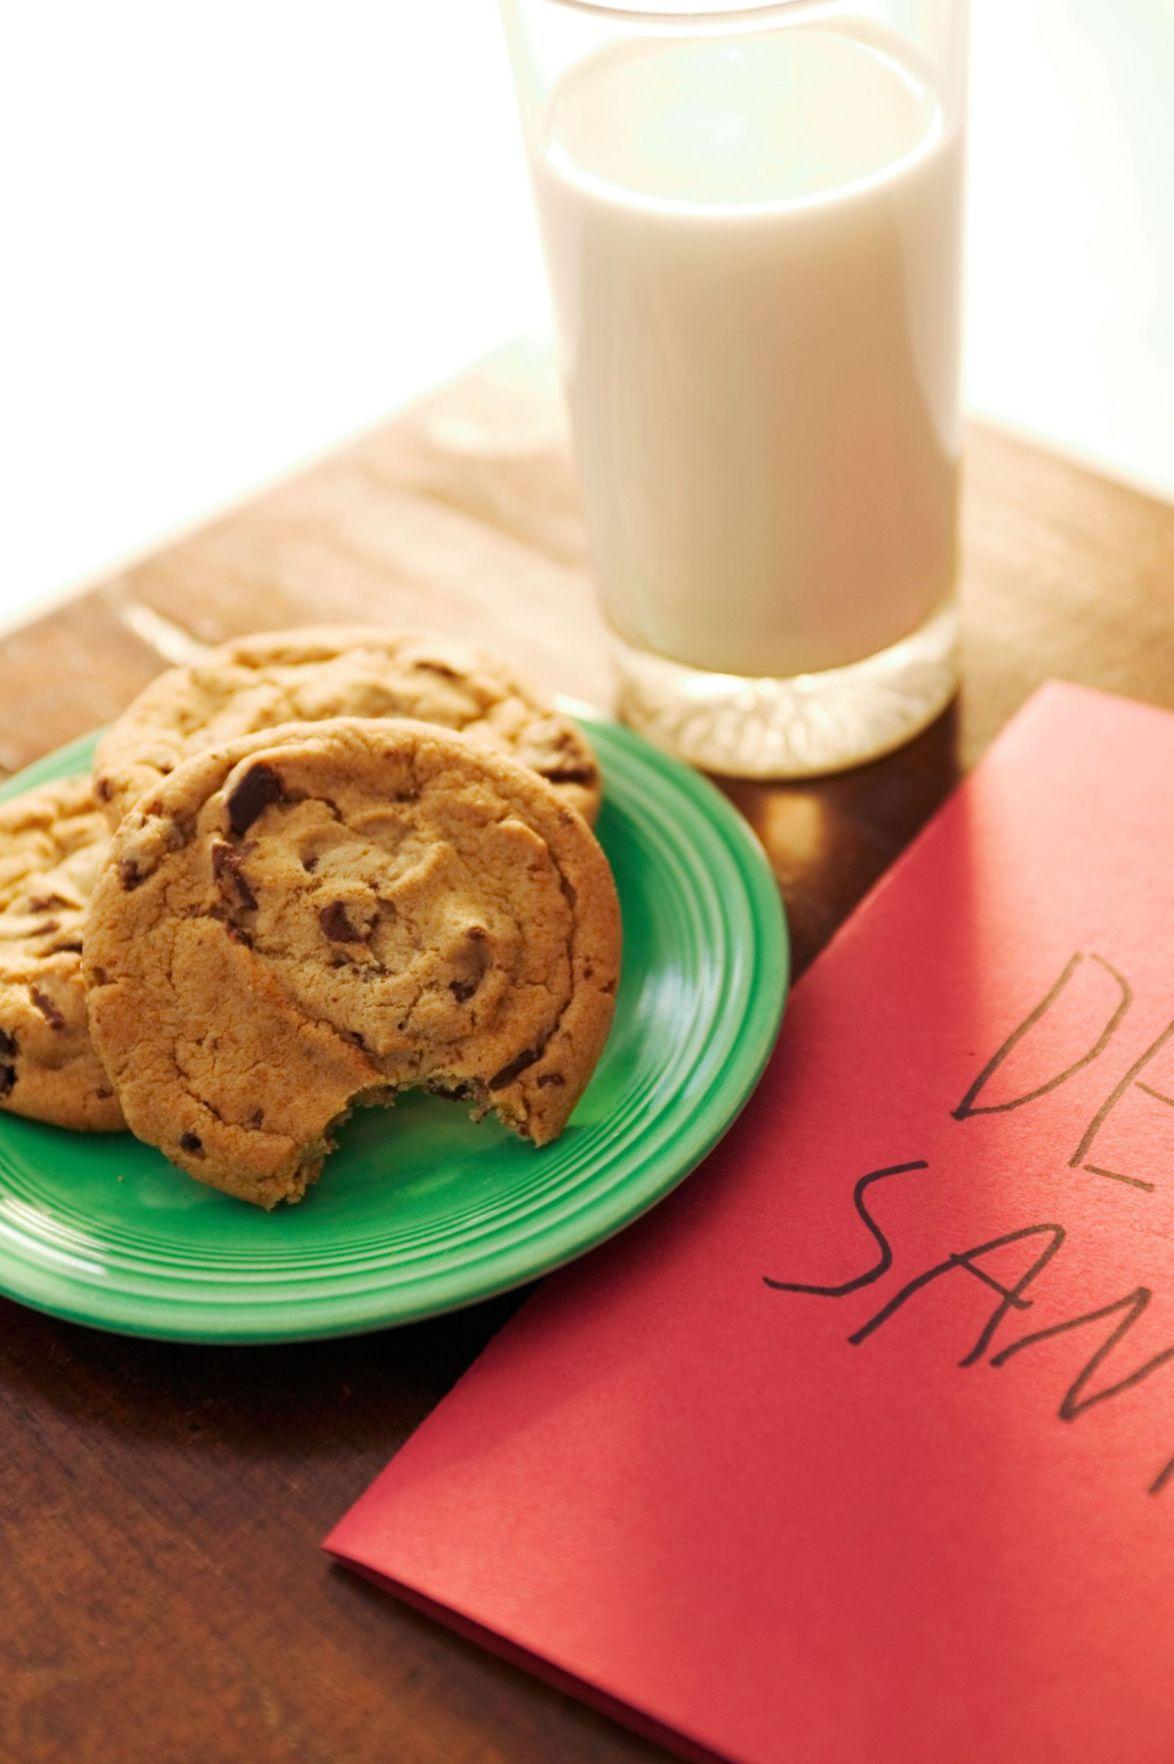 Dear Santa, cookies and milk